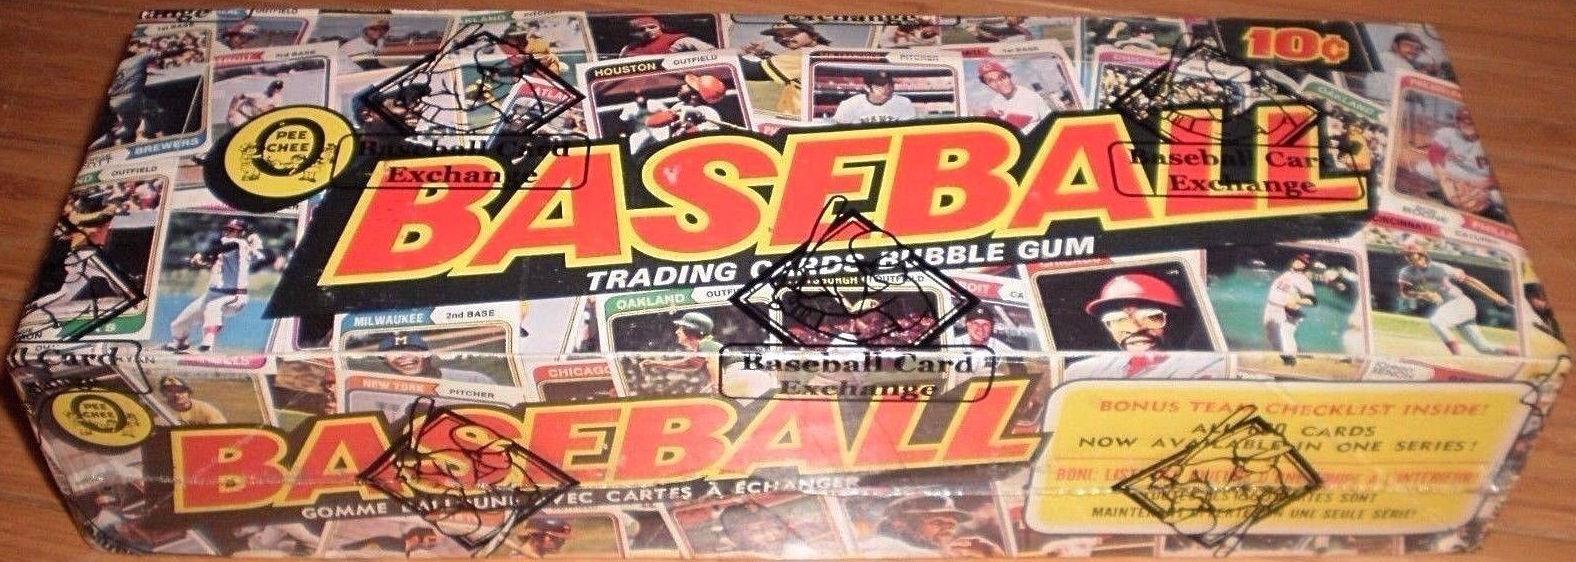 1974 O-Pee-Chee Baseball Cards Unopened Wax Box